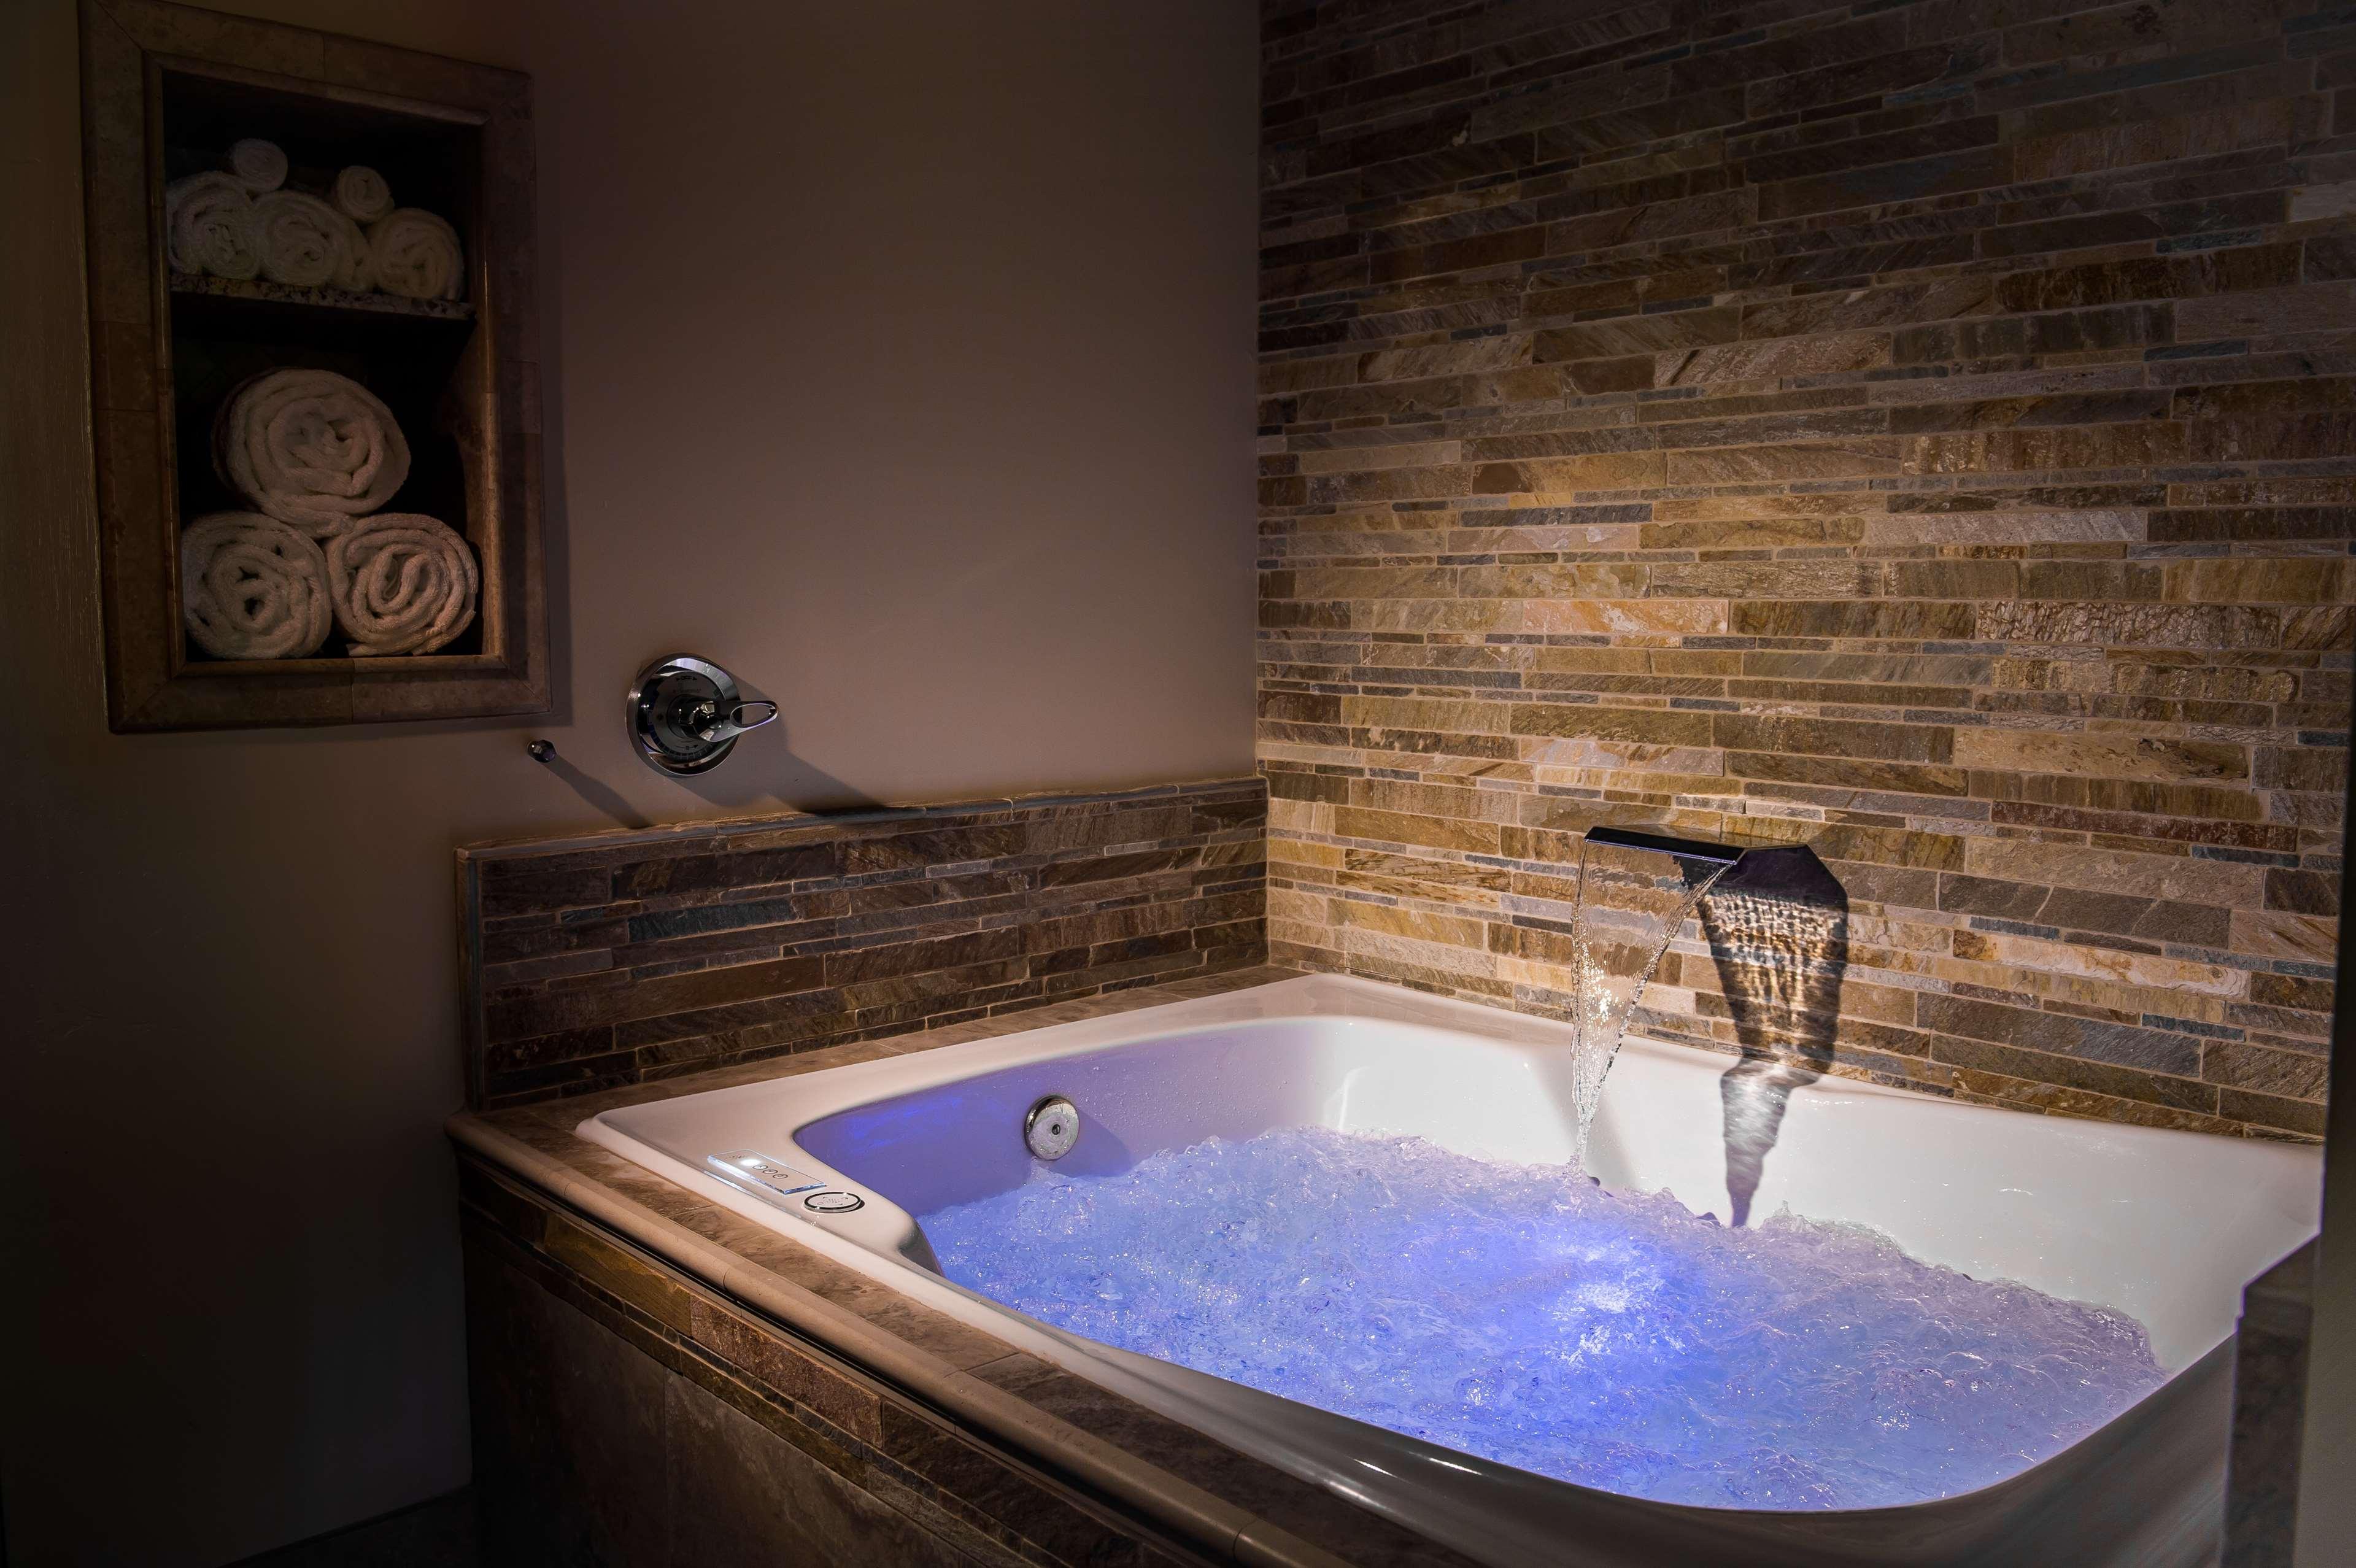 Best Western Plus Arroyo Roble Hotel & Creekside Villas image 31